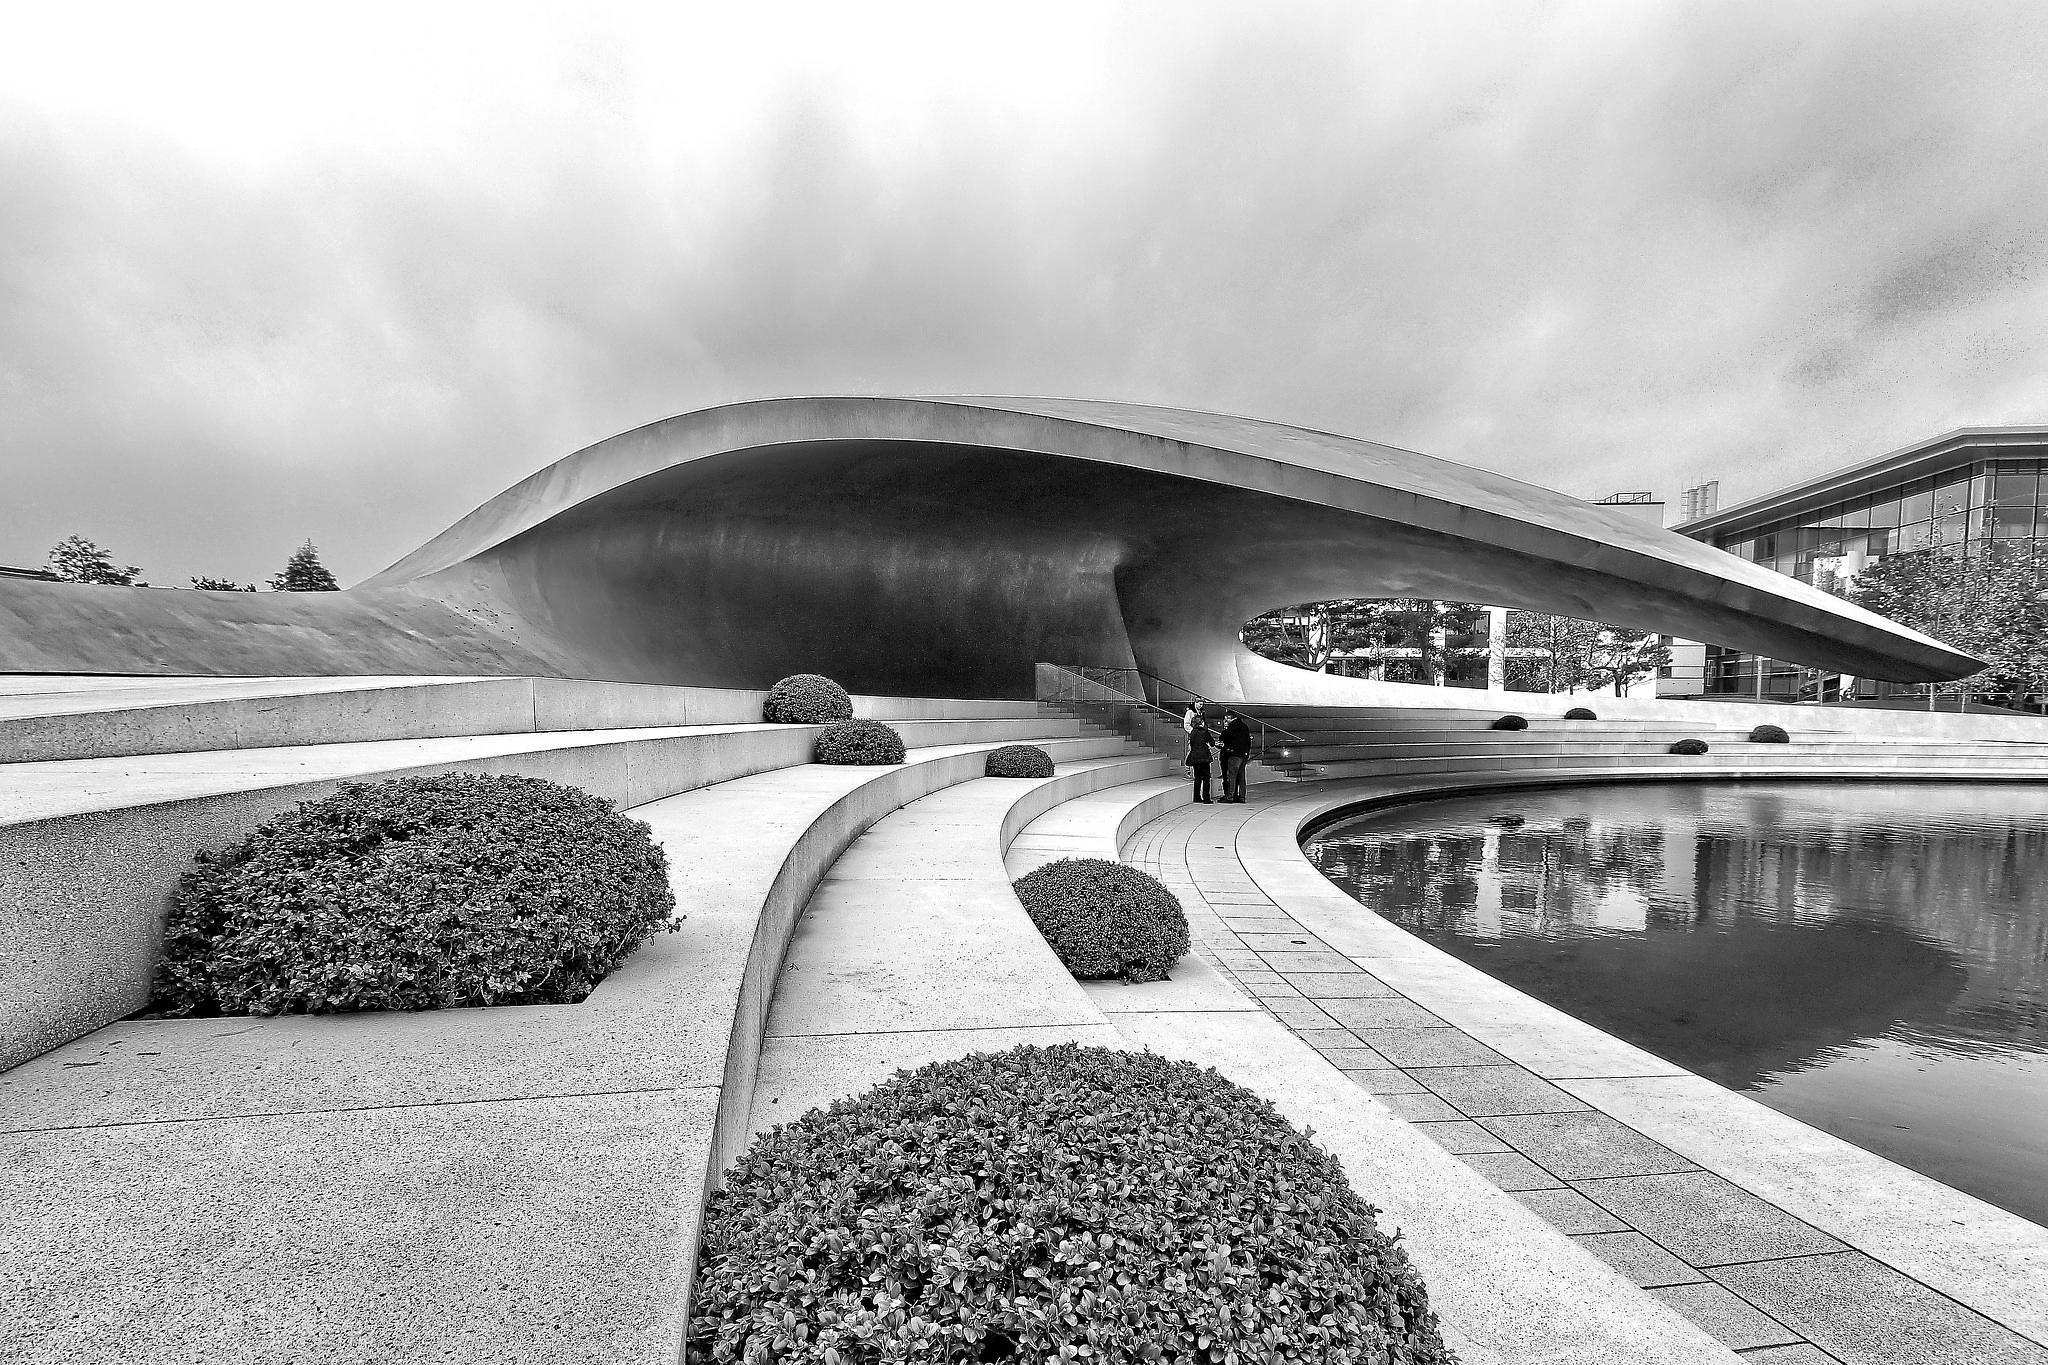 Porsche Pavilion by JeckstadtPhotography